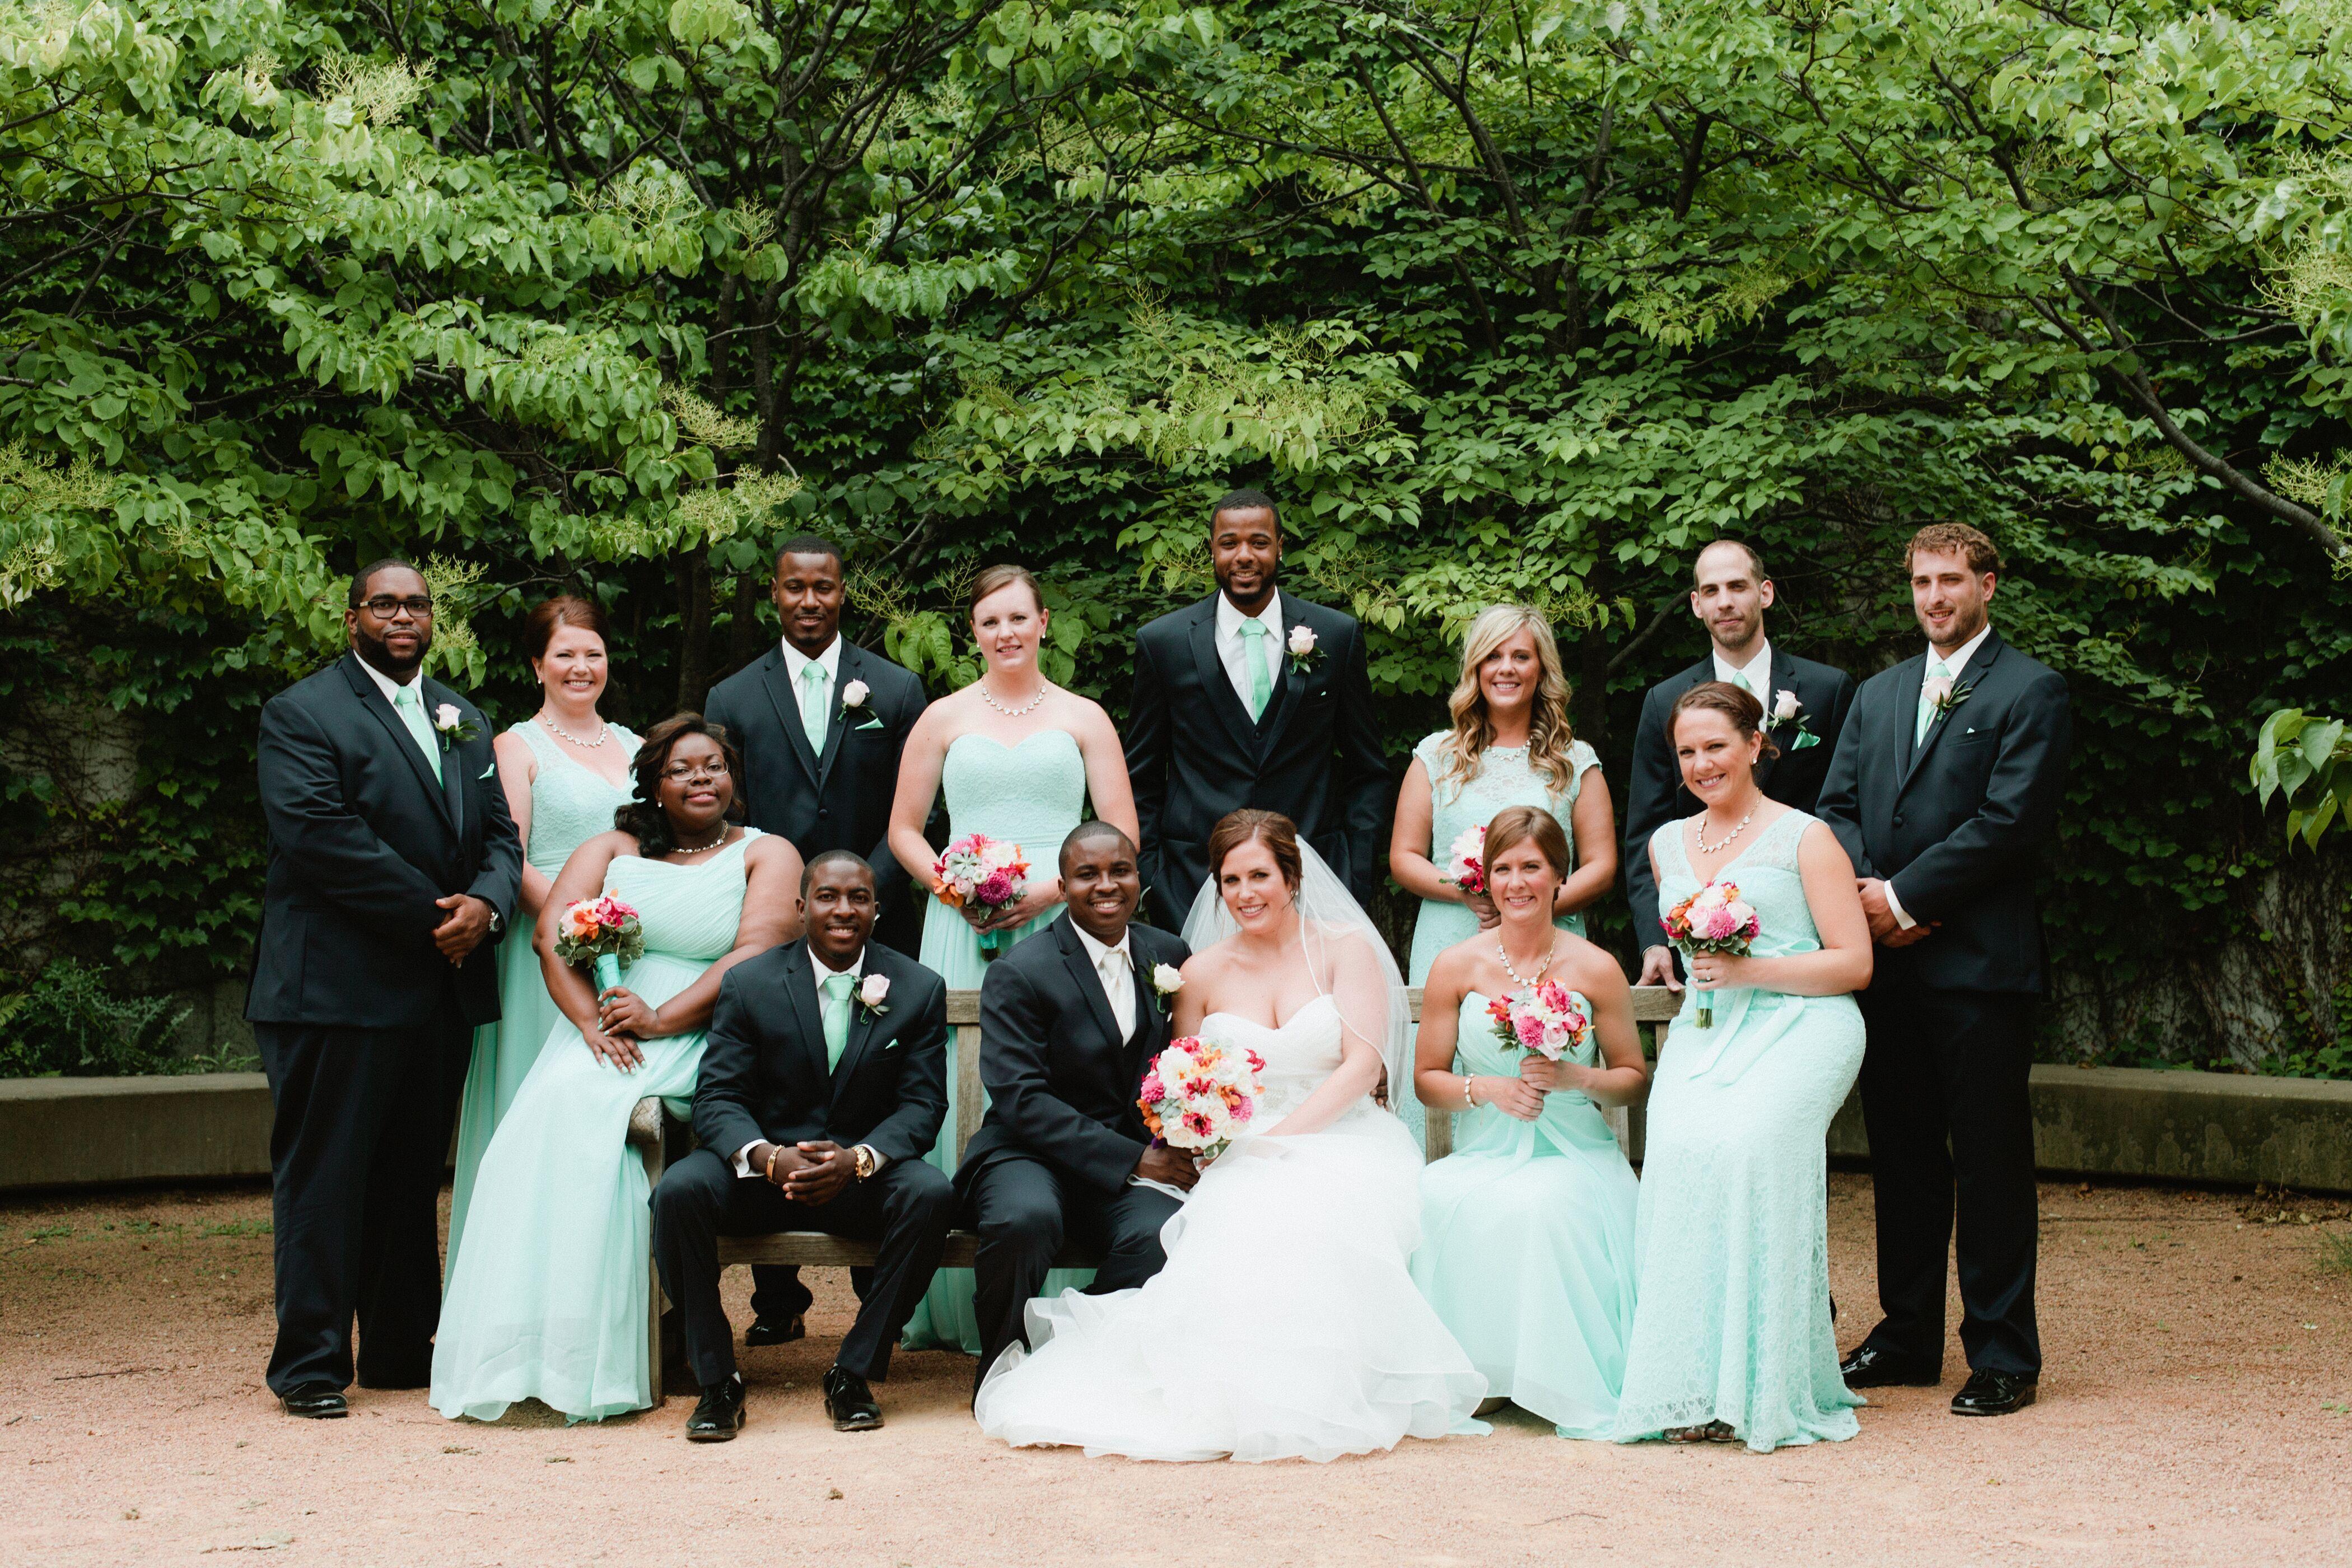 Marriott minneapolis wedding